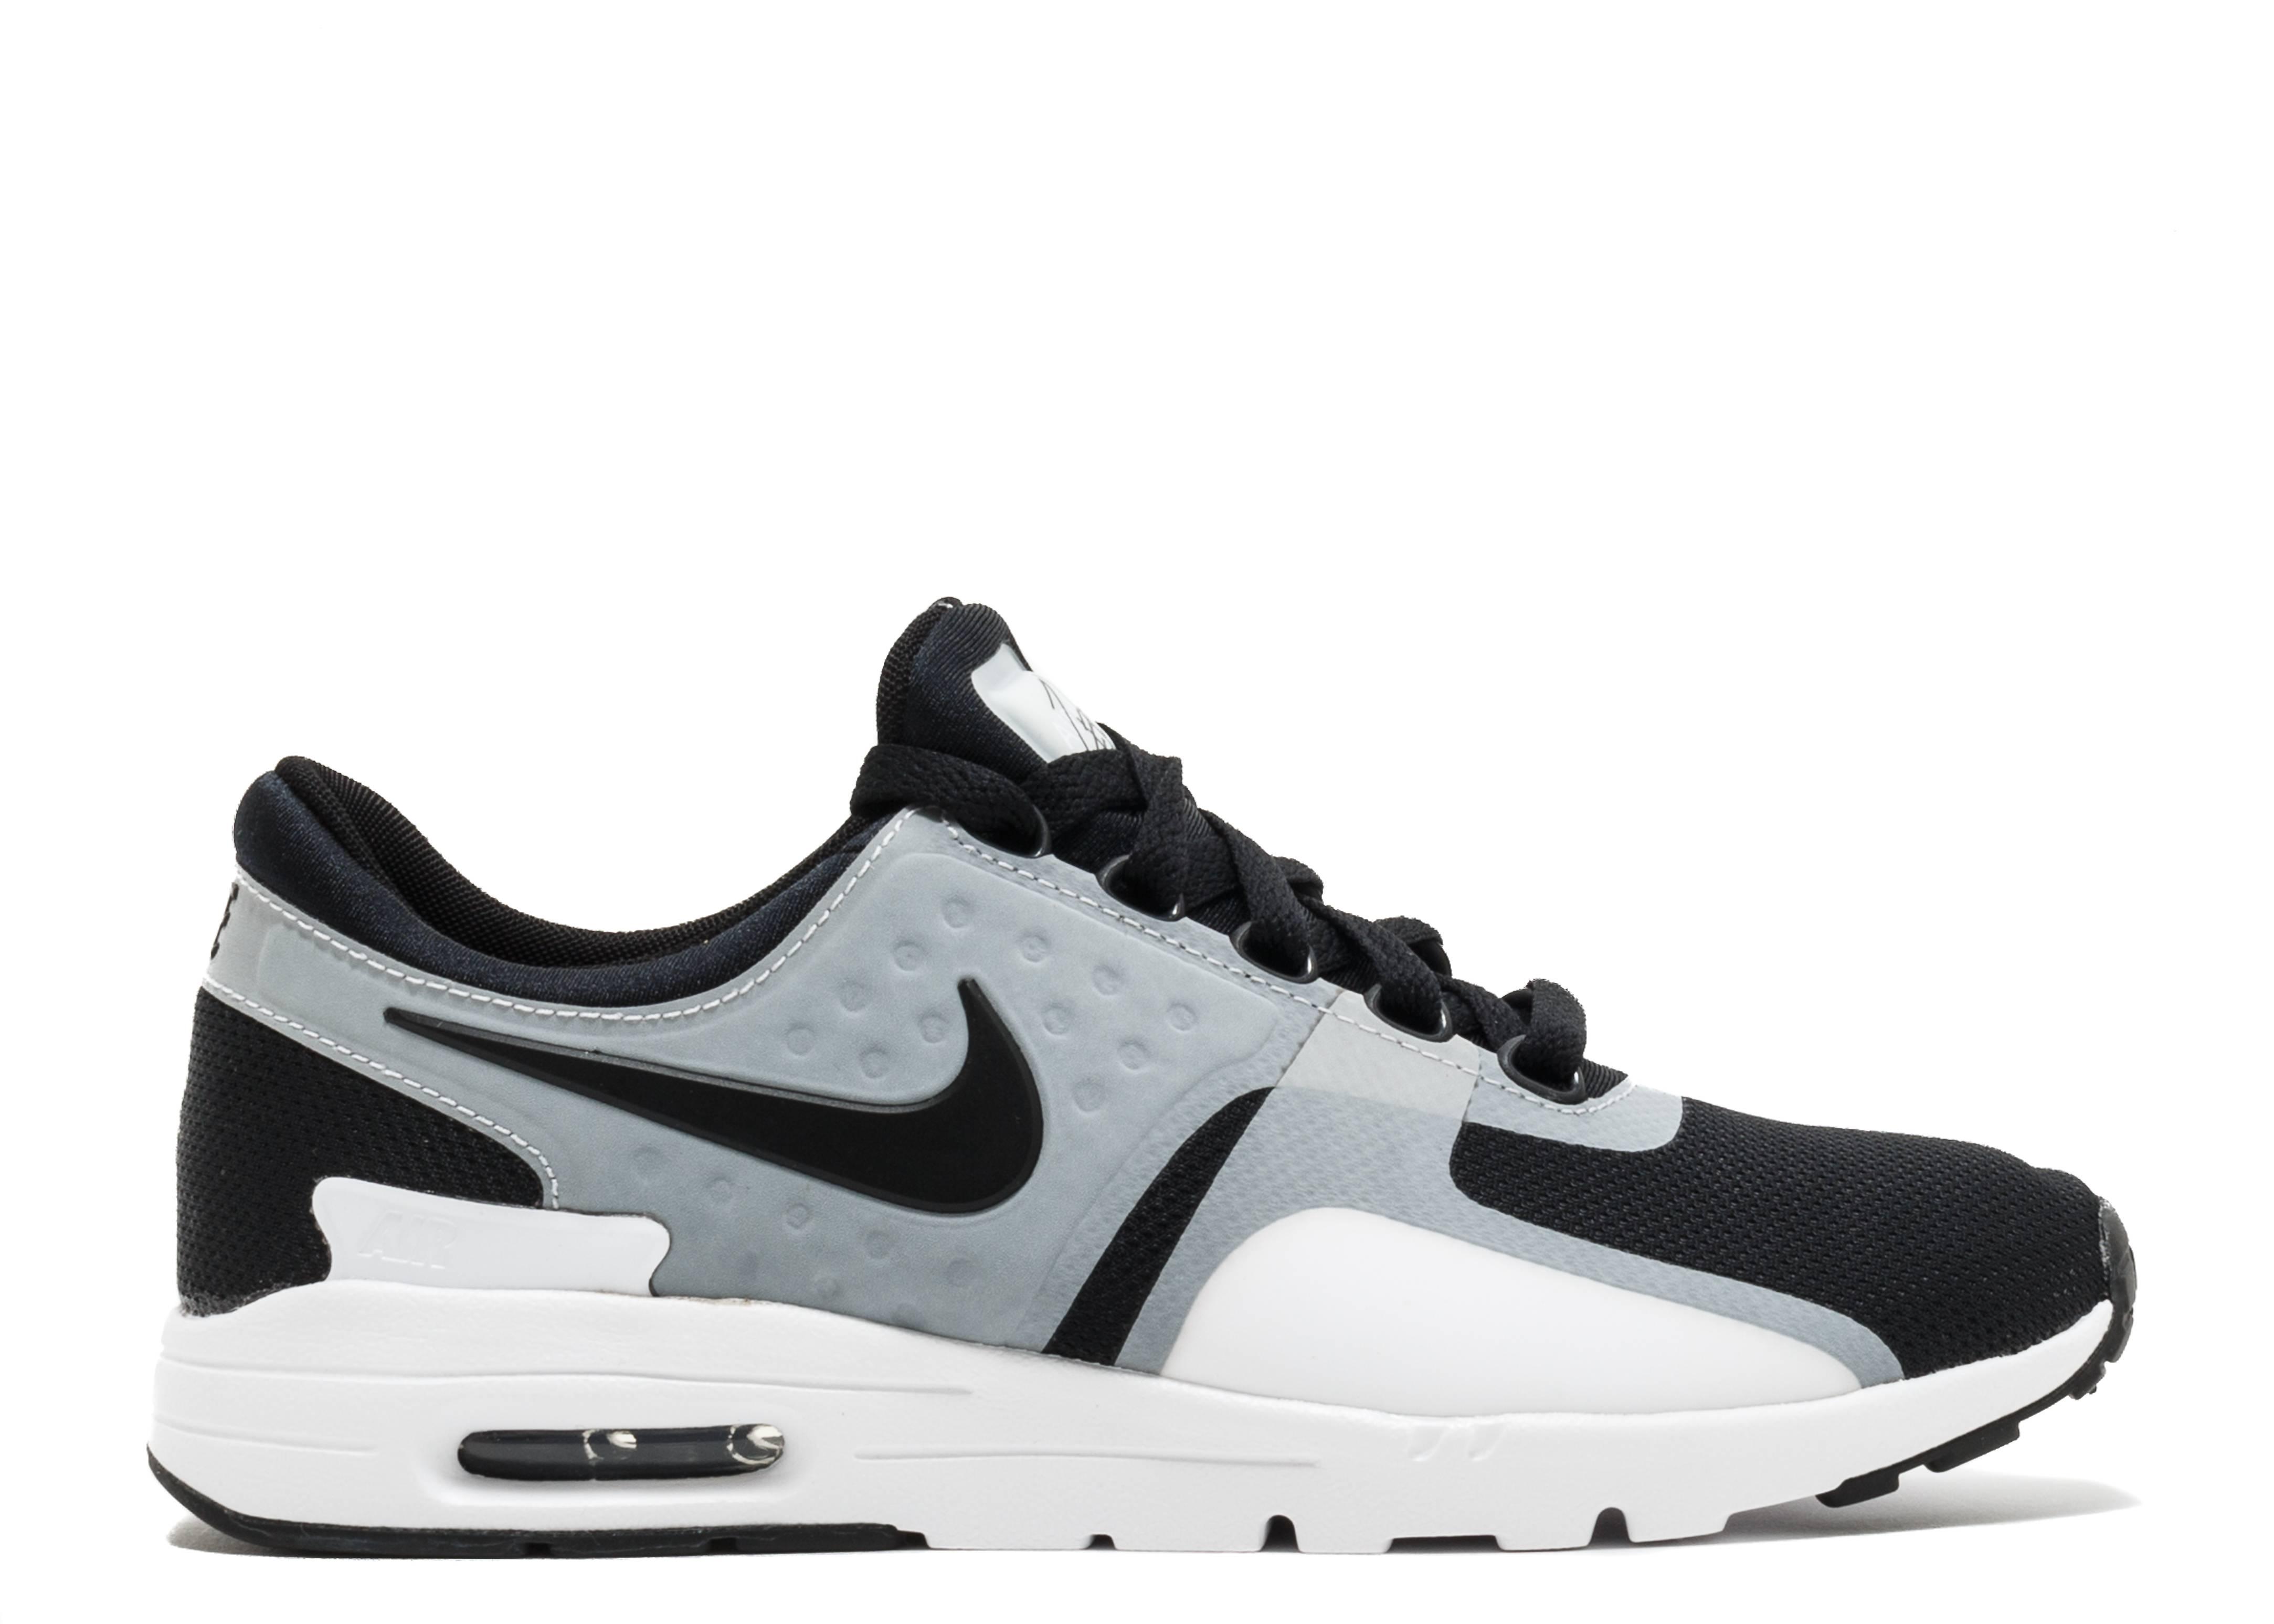 Nike Air Max Zero QS Silver Bullet ~ 863700 002 ~ Uk Size 6.5 ~ Euro 40.5